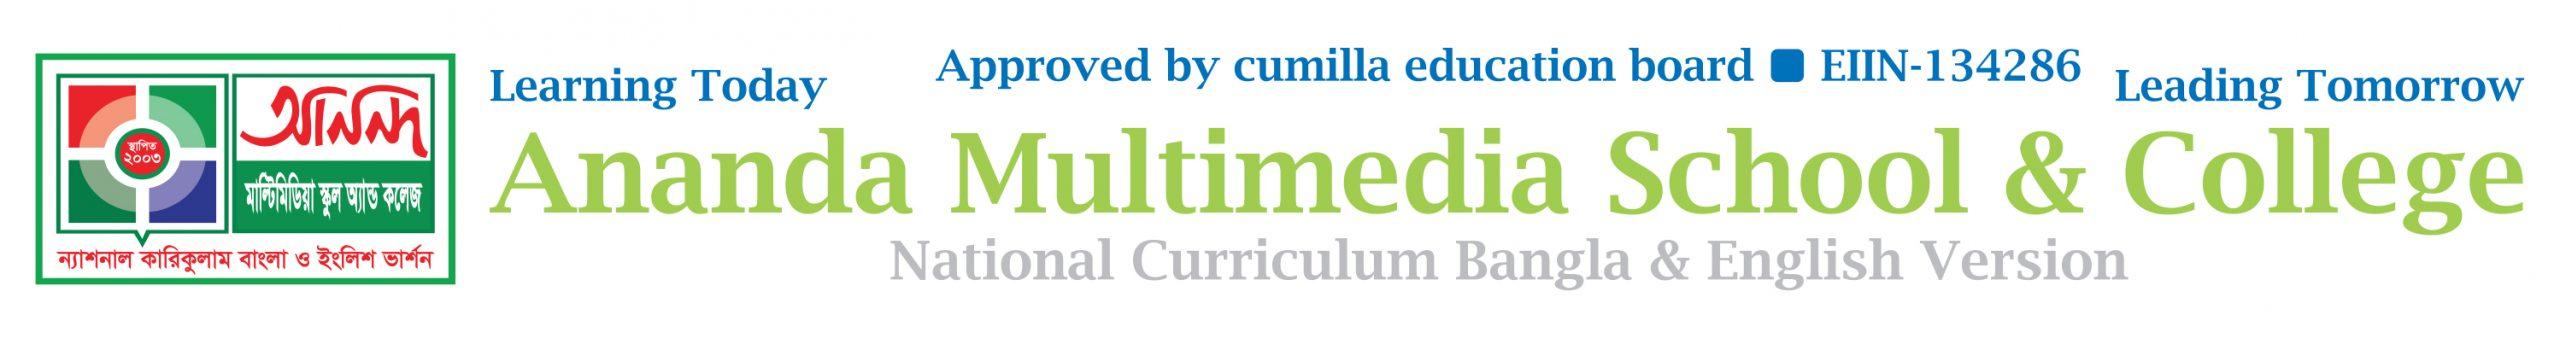 Ananda Multimedia School & College